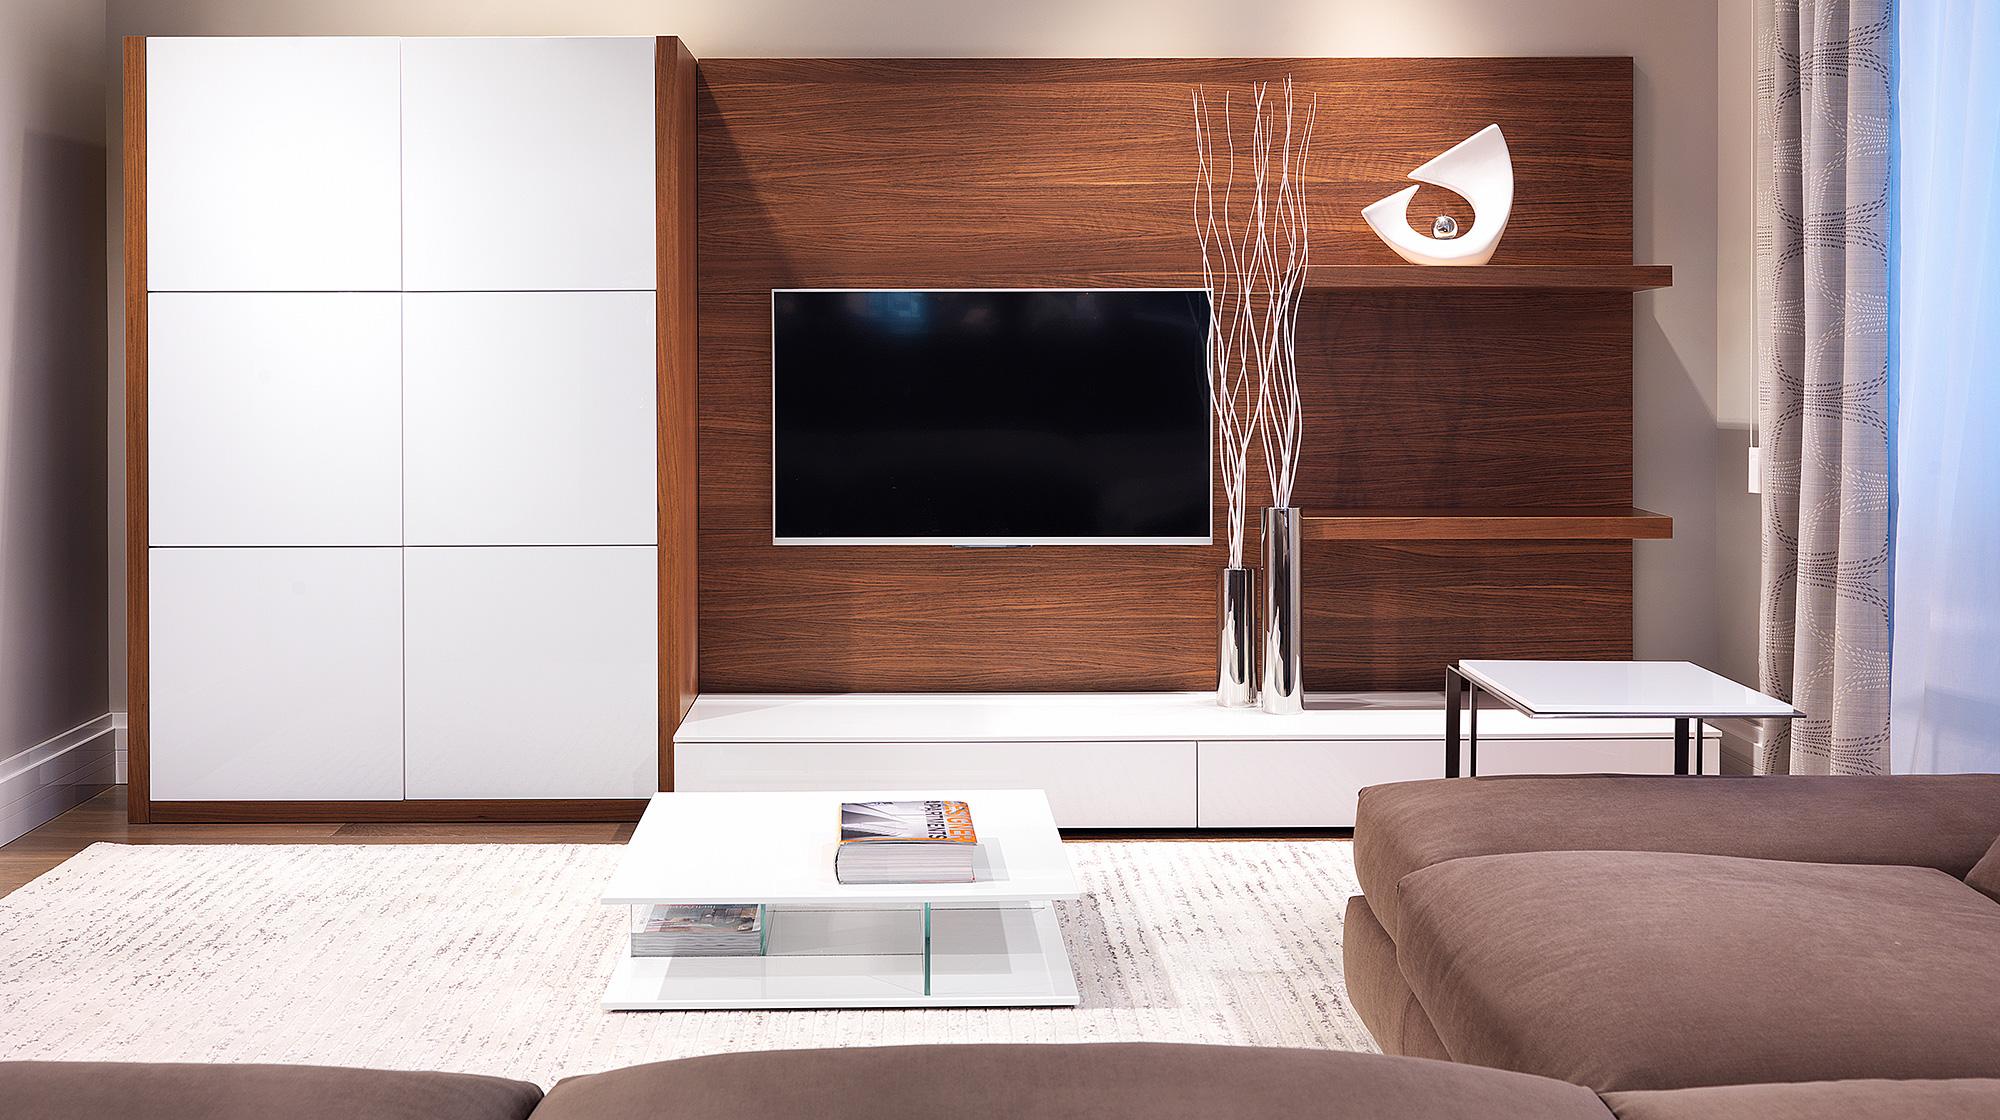 Интерьер квартиры. Фотосъемка элитной недвижимости для журнала Interiors